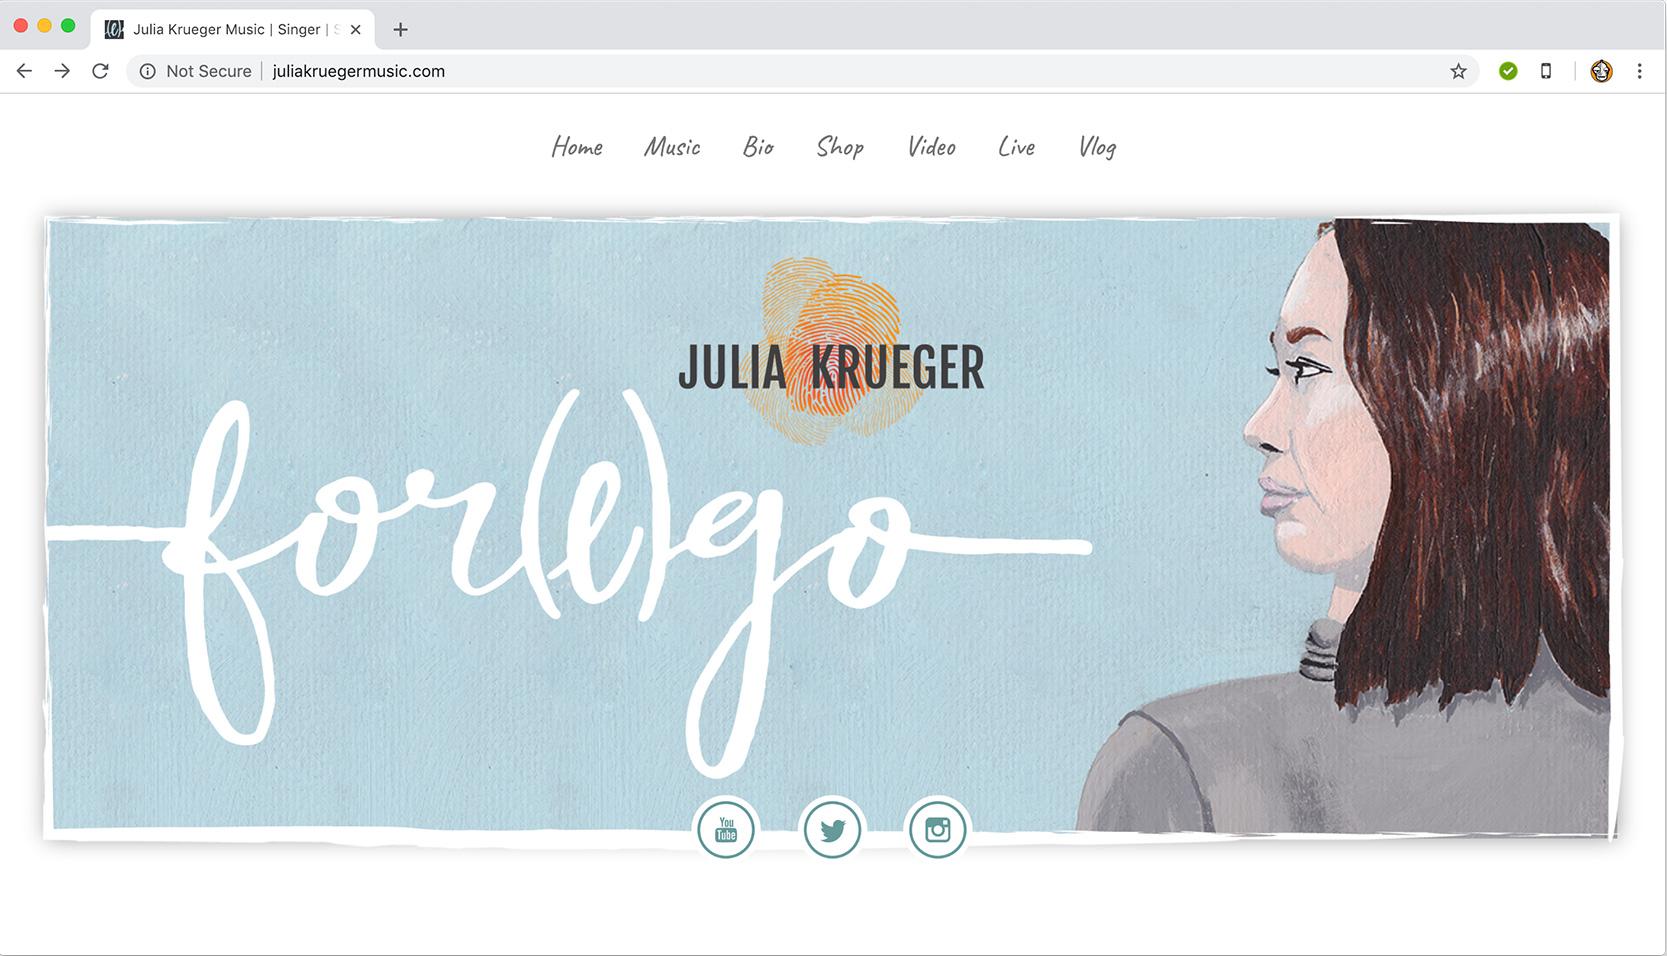 Julia Krueger Website Landing Page